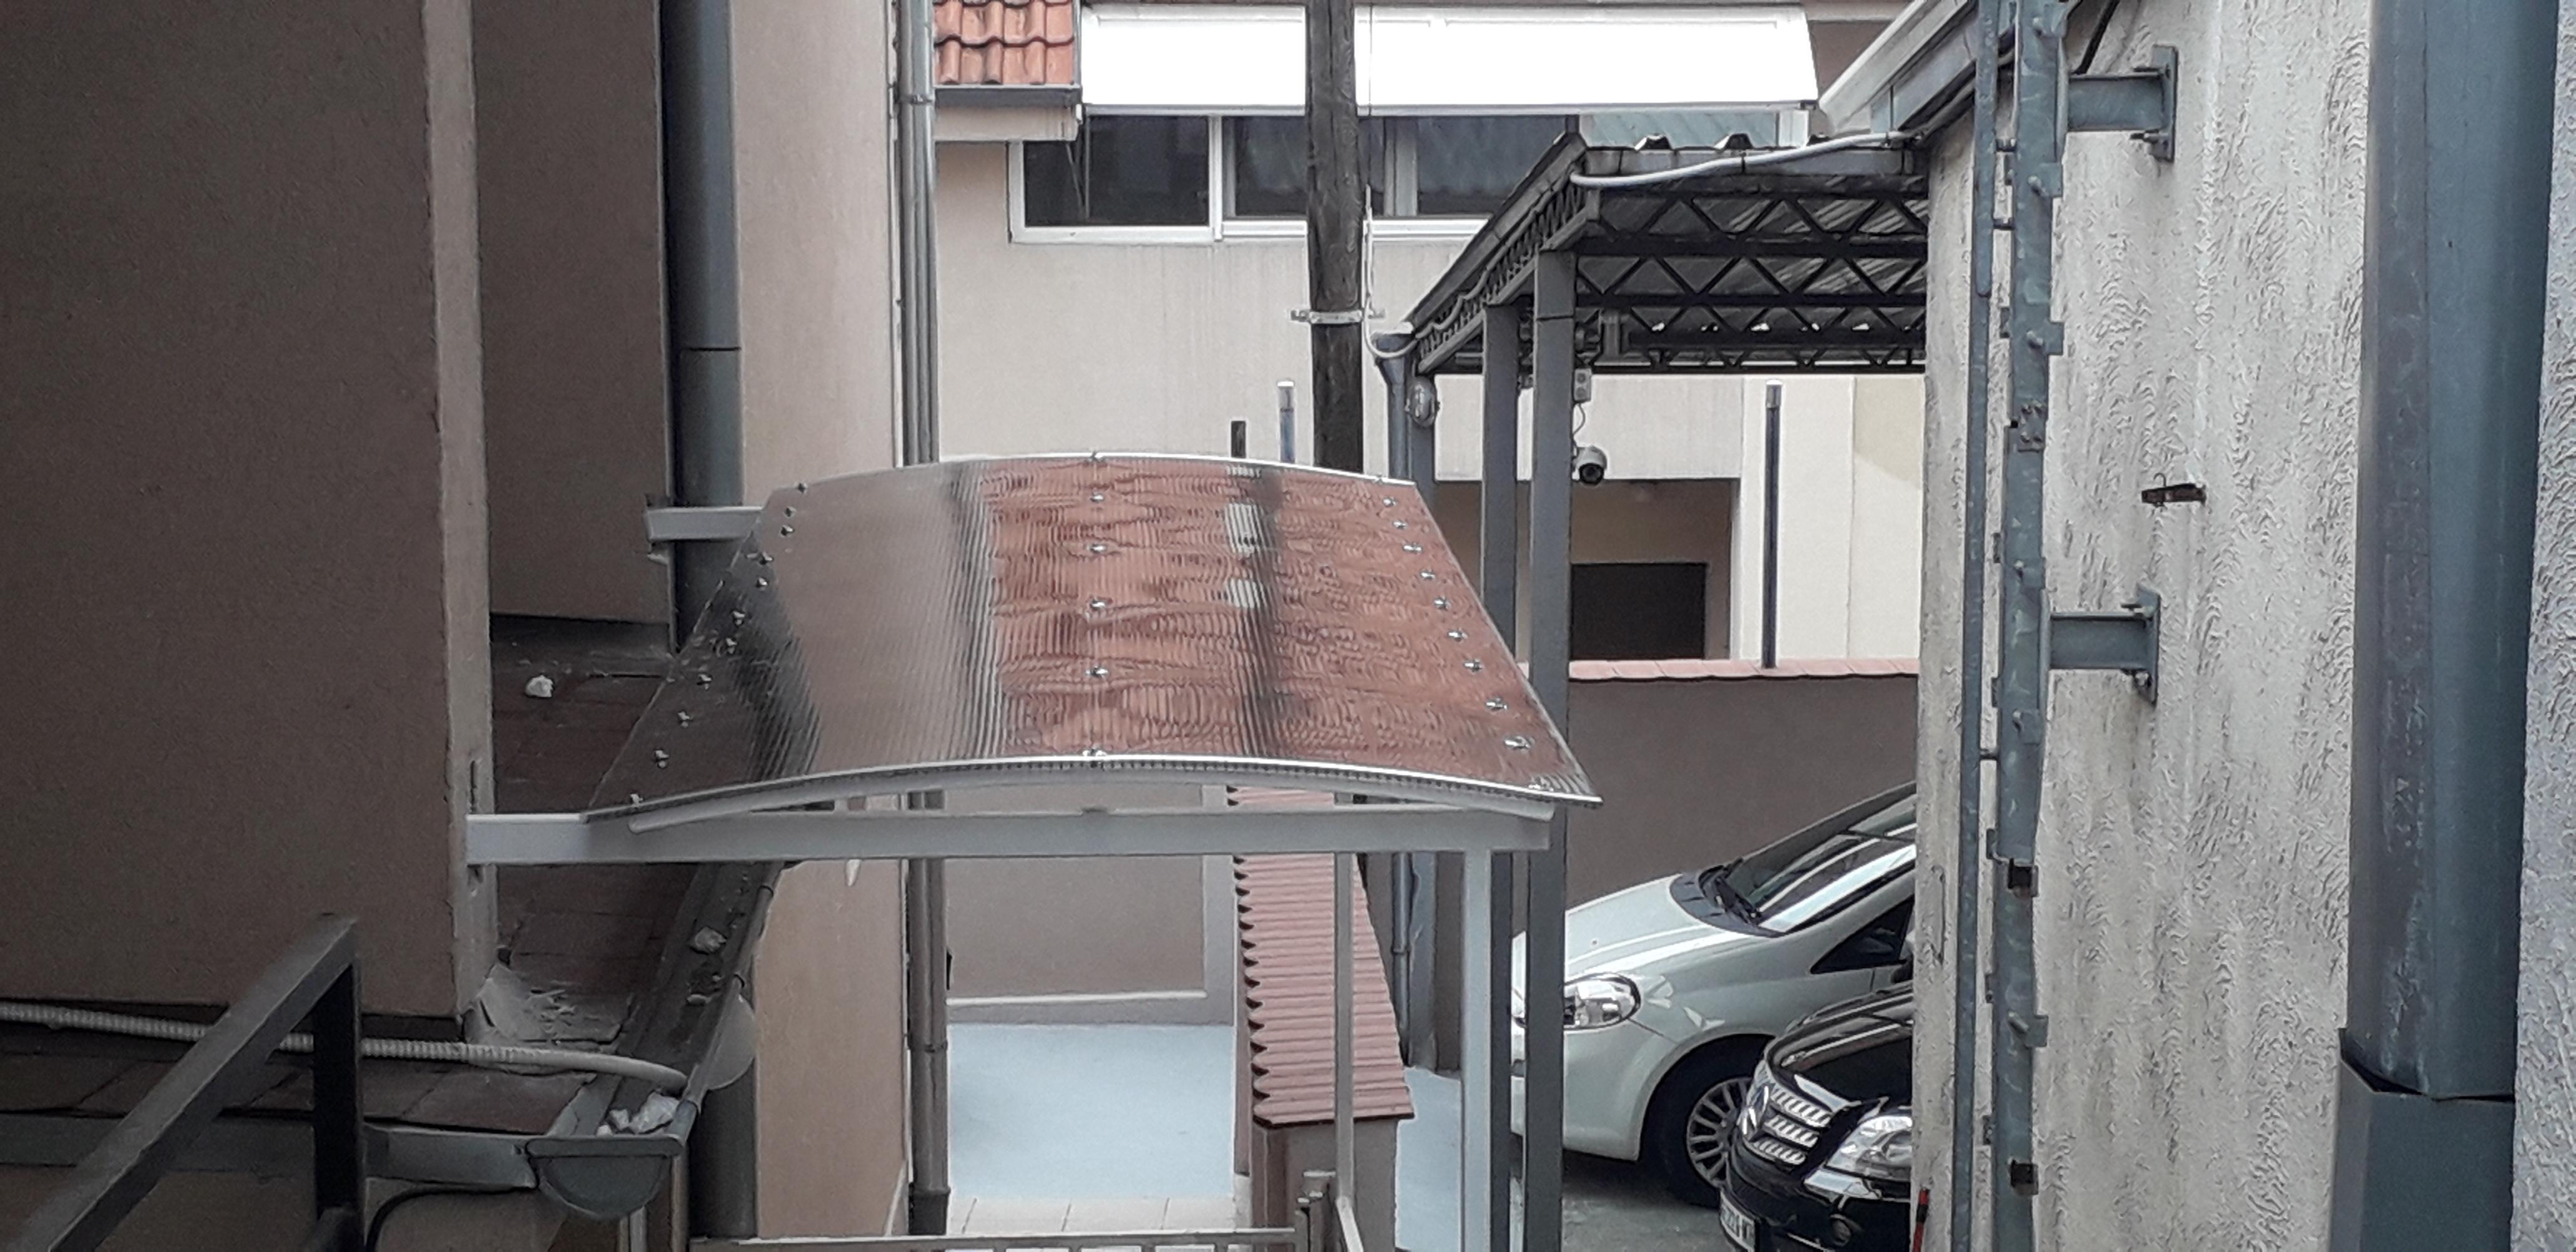 nadstrešnica ispred vrata